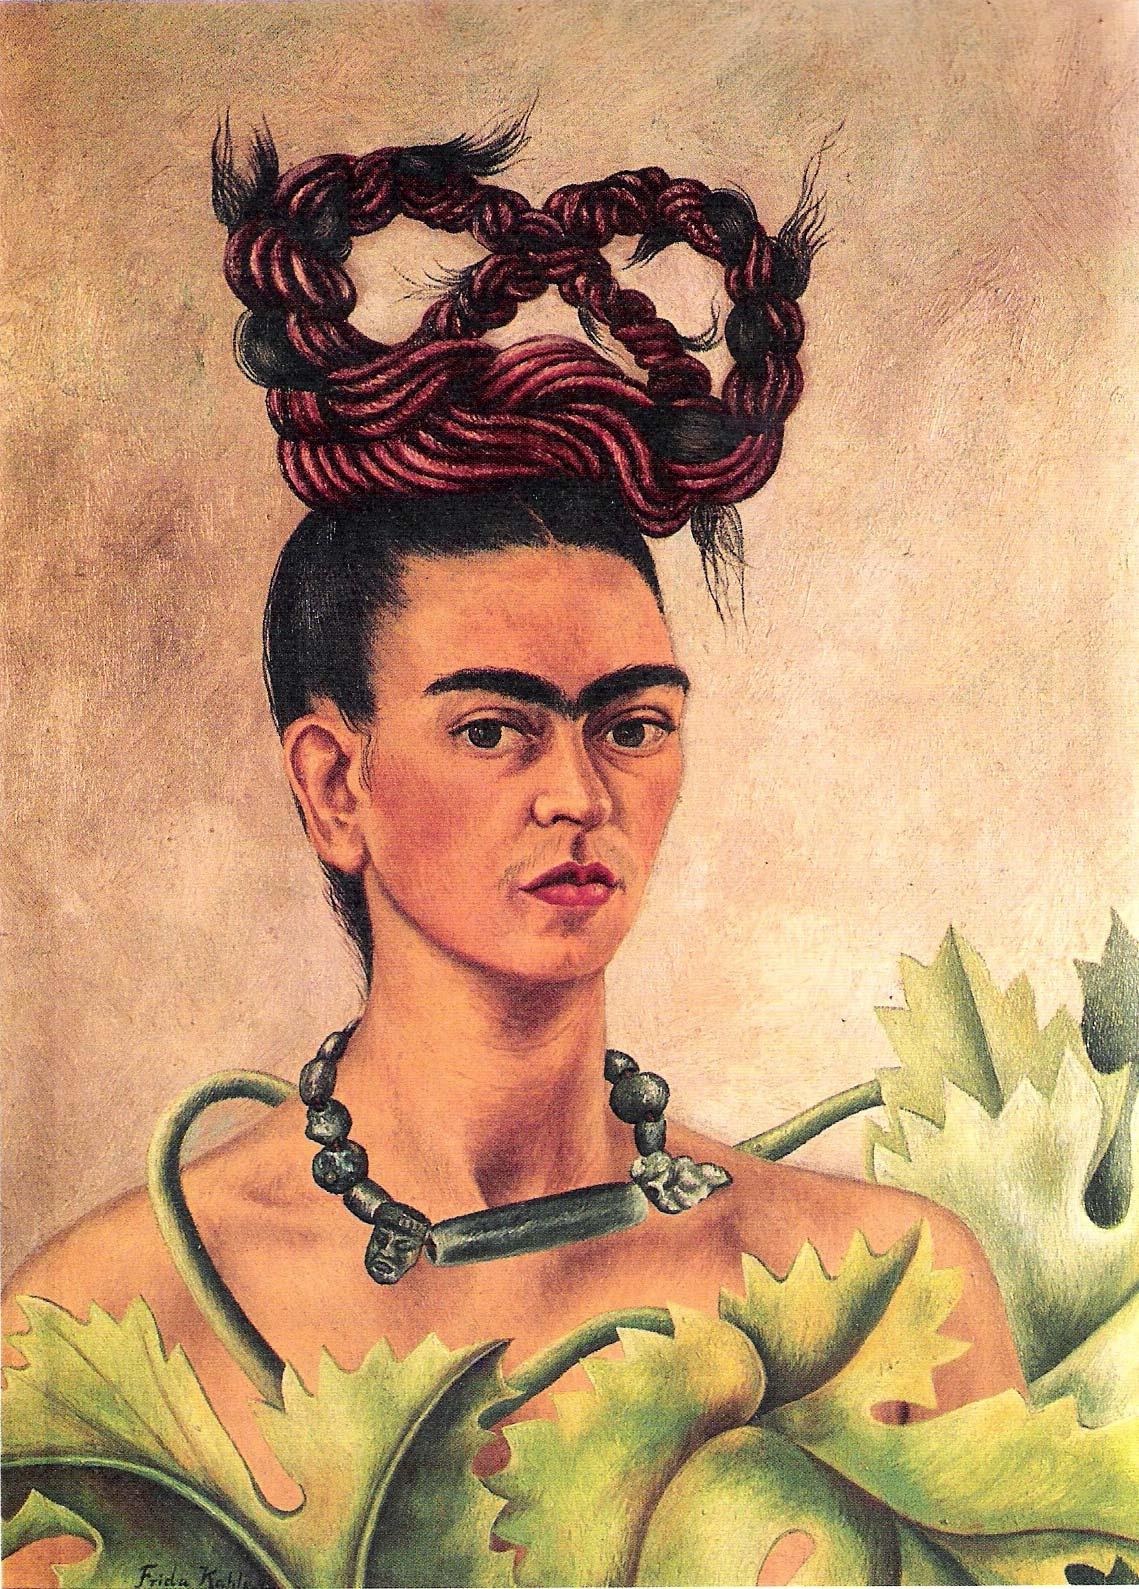 Pintores latinoamericanos que debes conocer